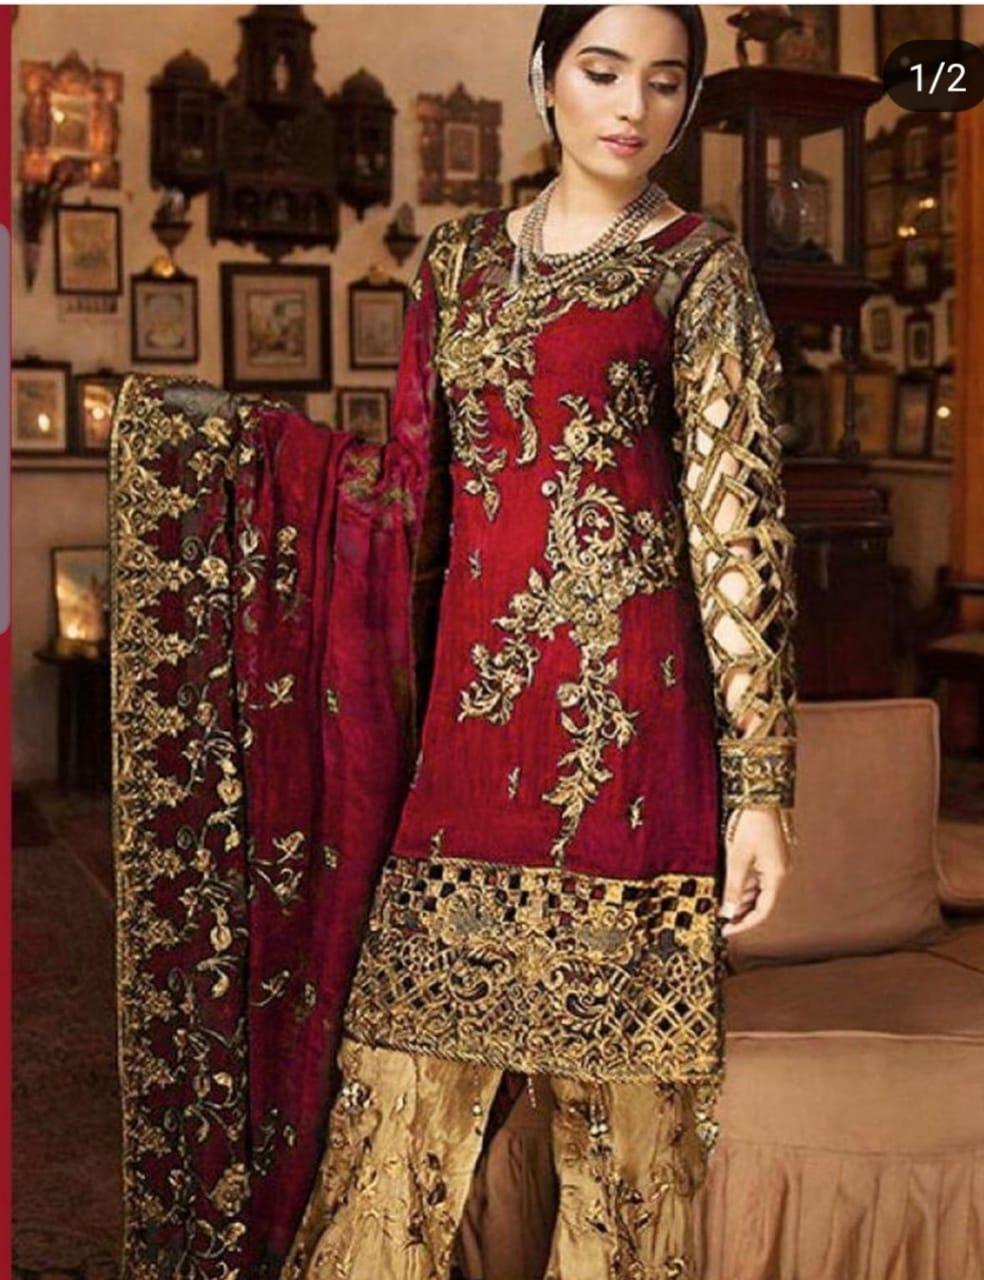 Buy Women's Pakistani Dresses & Traditional Clothing Online